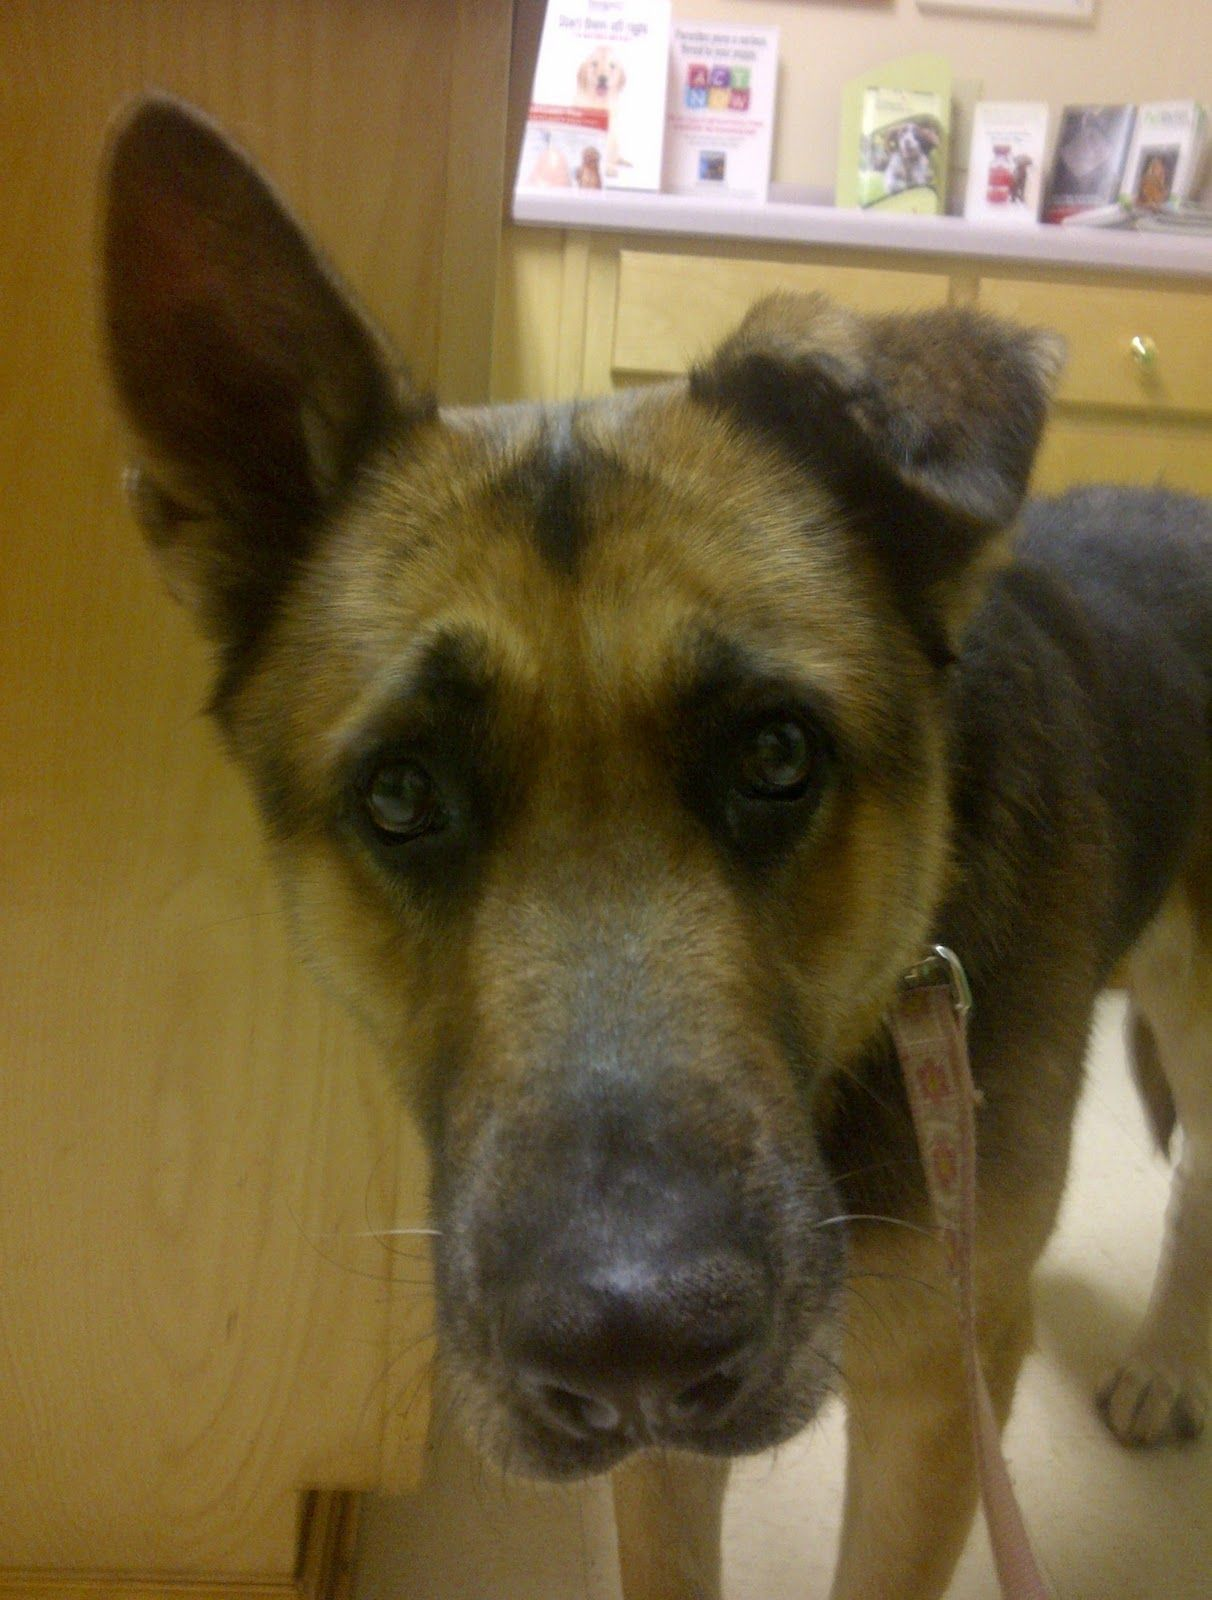 Best Floppy Ears Brown Adorable Dog - 16331db1dc713383c467d35074d20274  2018_472876  .jpg